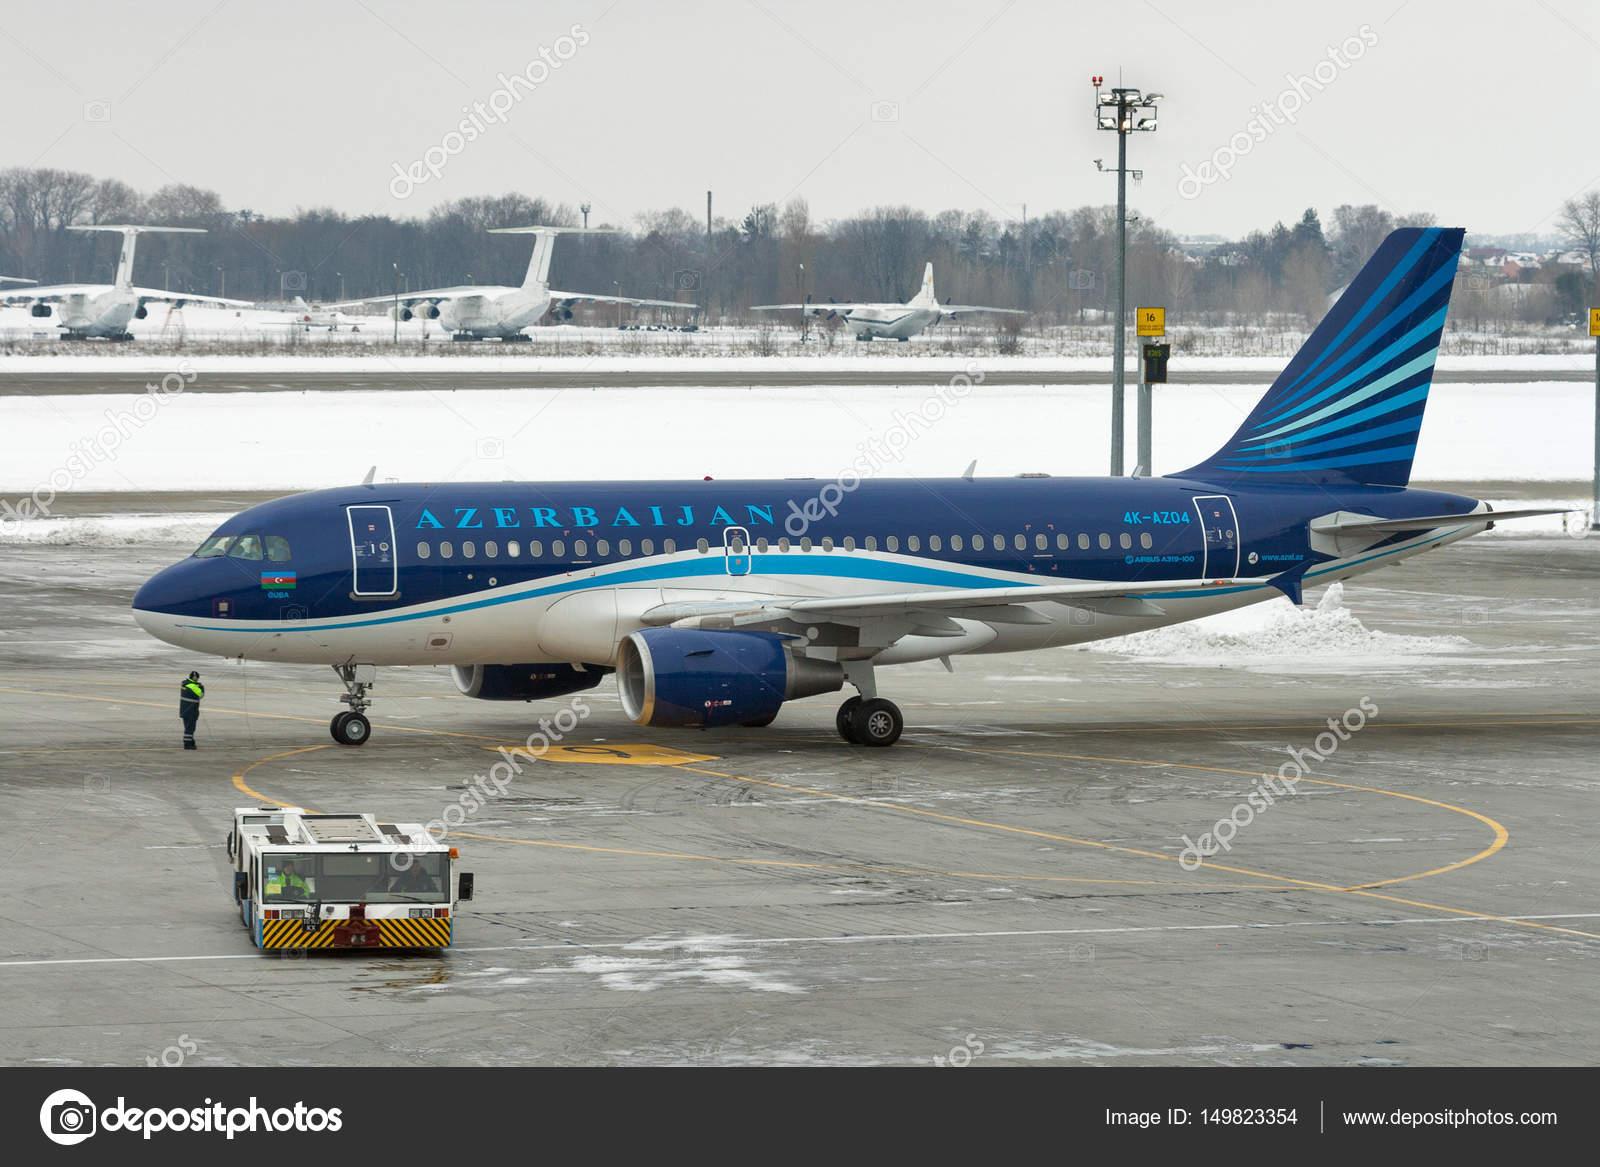 Aeroporto Kiev : Azerbaijan airlines airplane in boryspil airport kiev ukraine